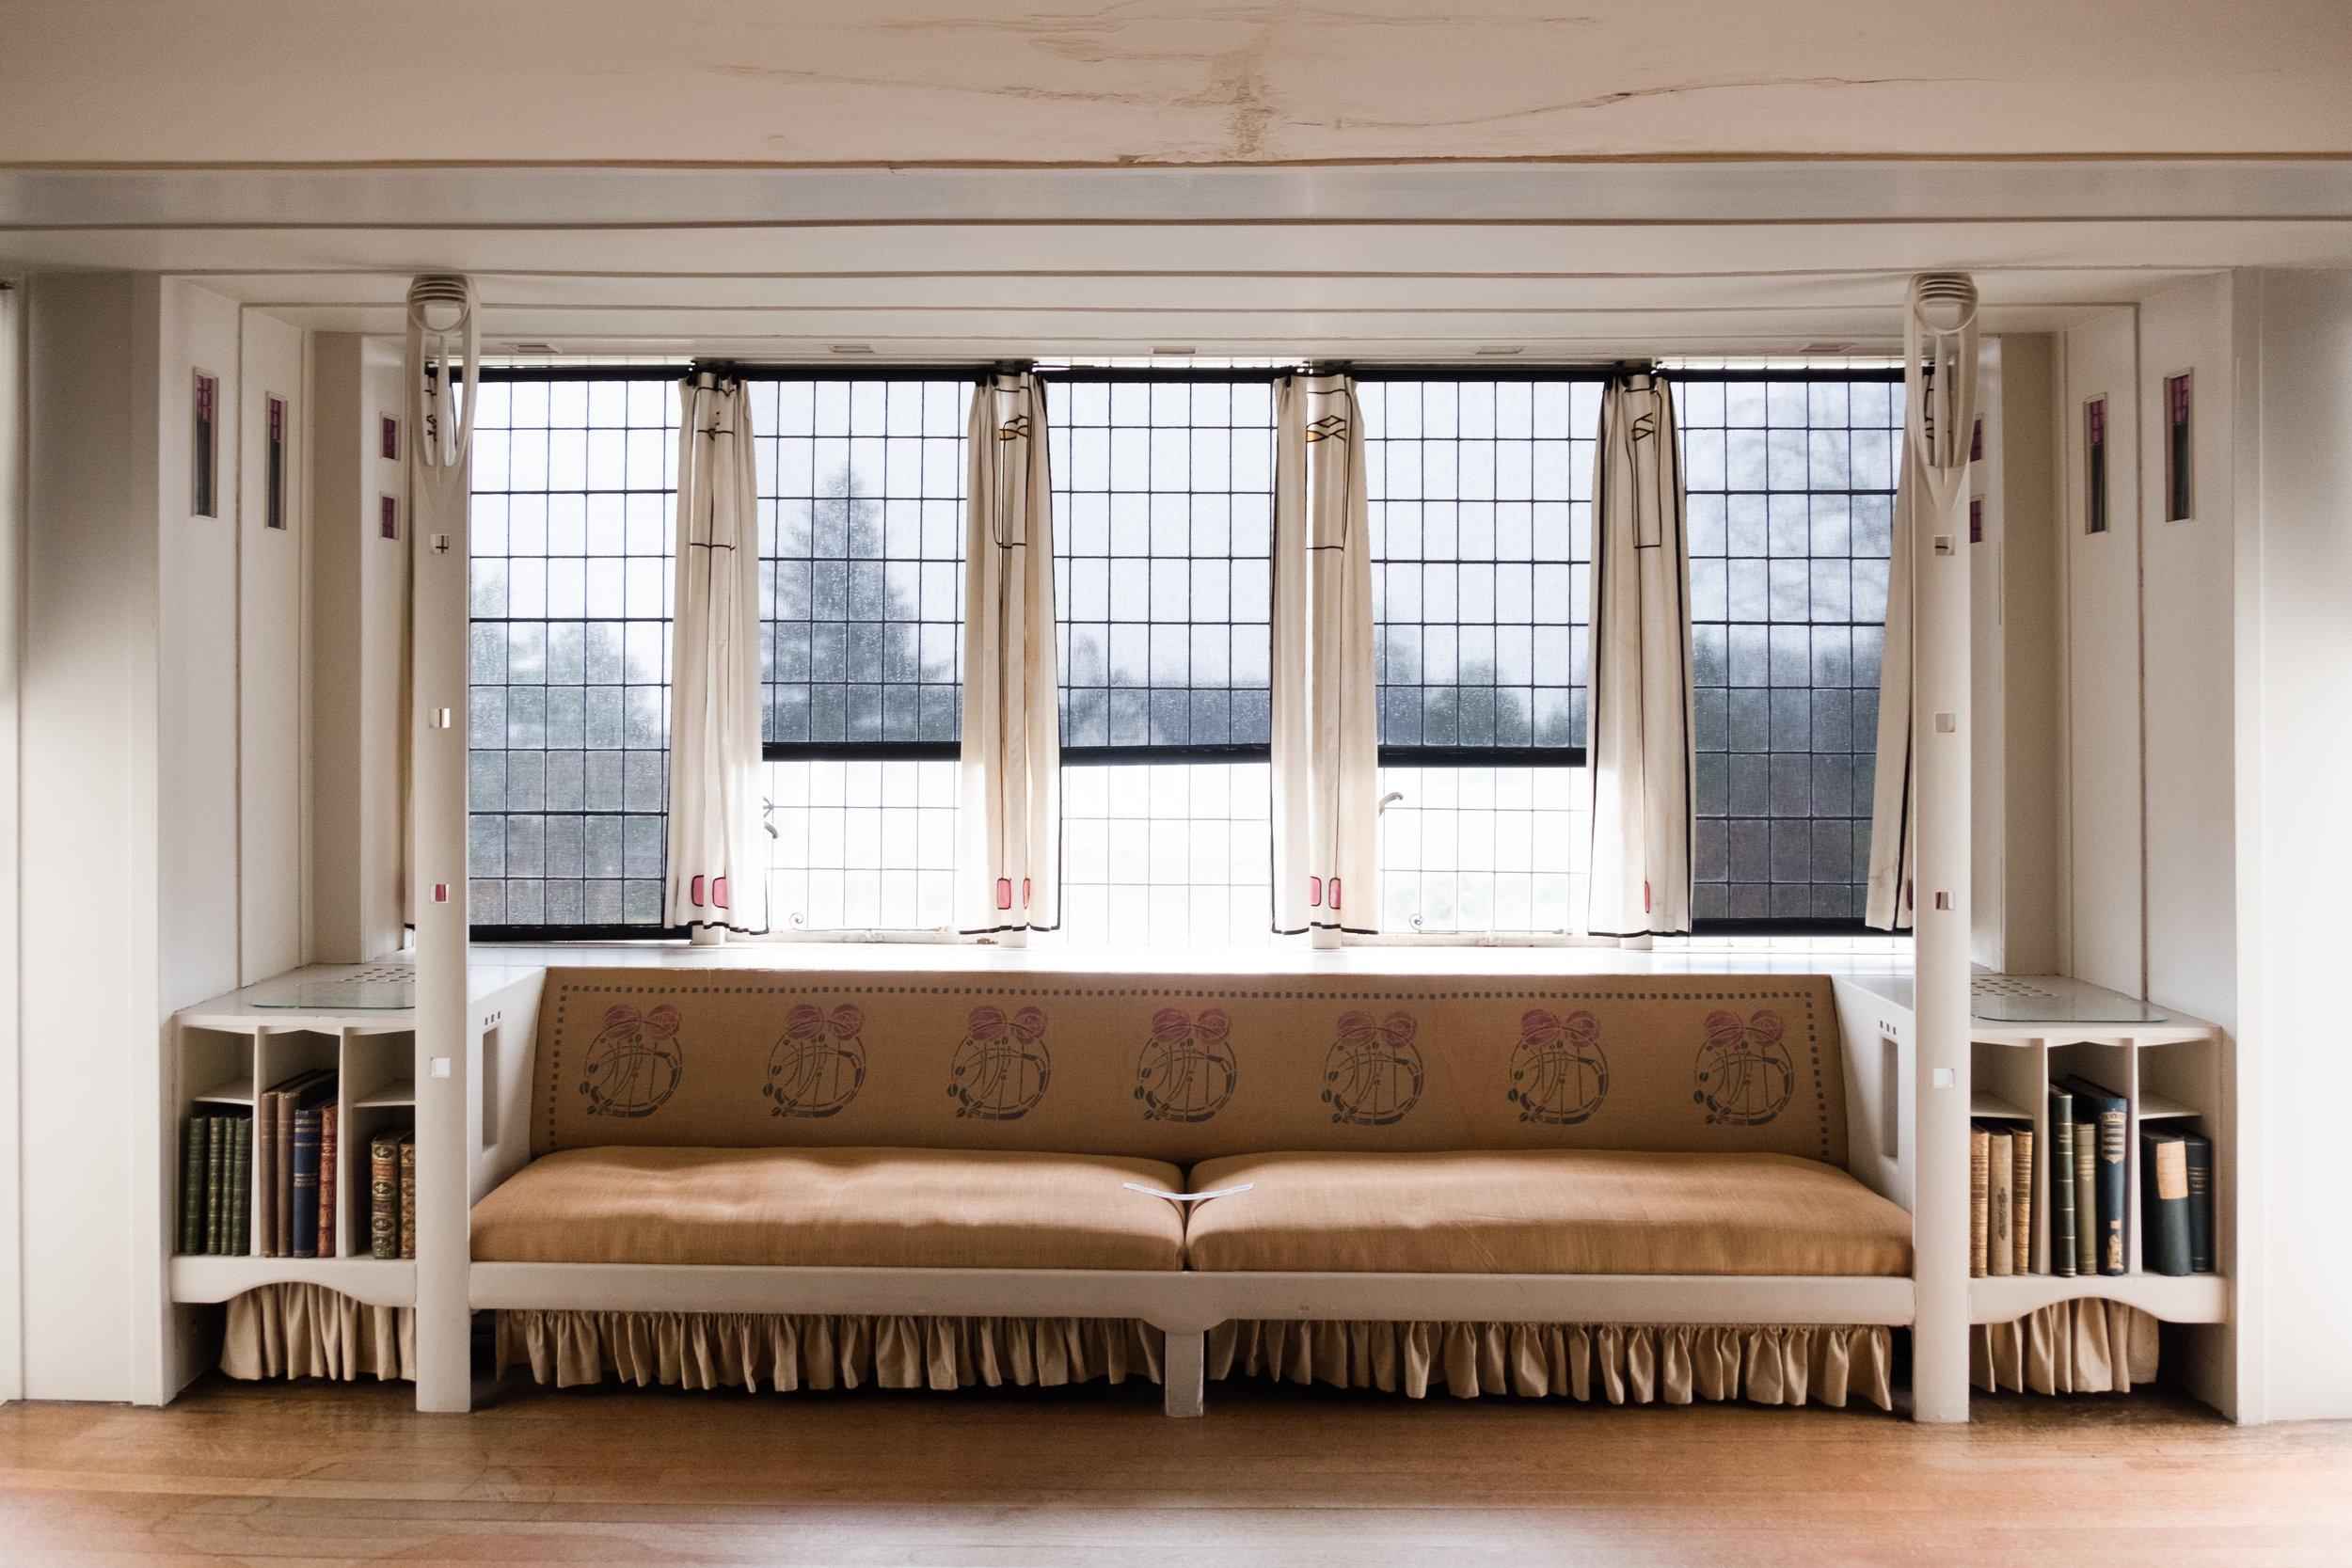 Charles-mackintosh--the-hill-house-architecture-design-helensburgh-scotland-3.jpg